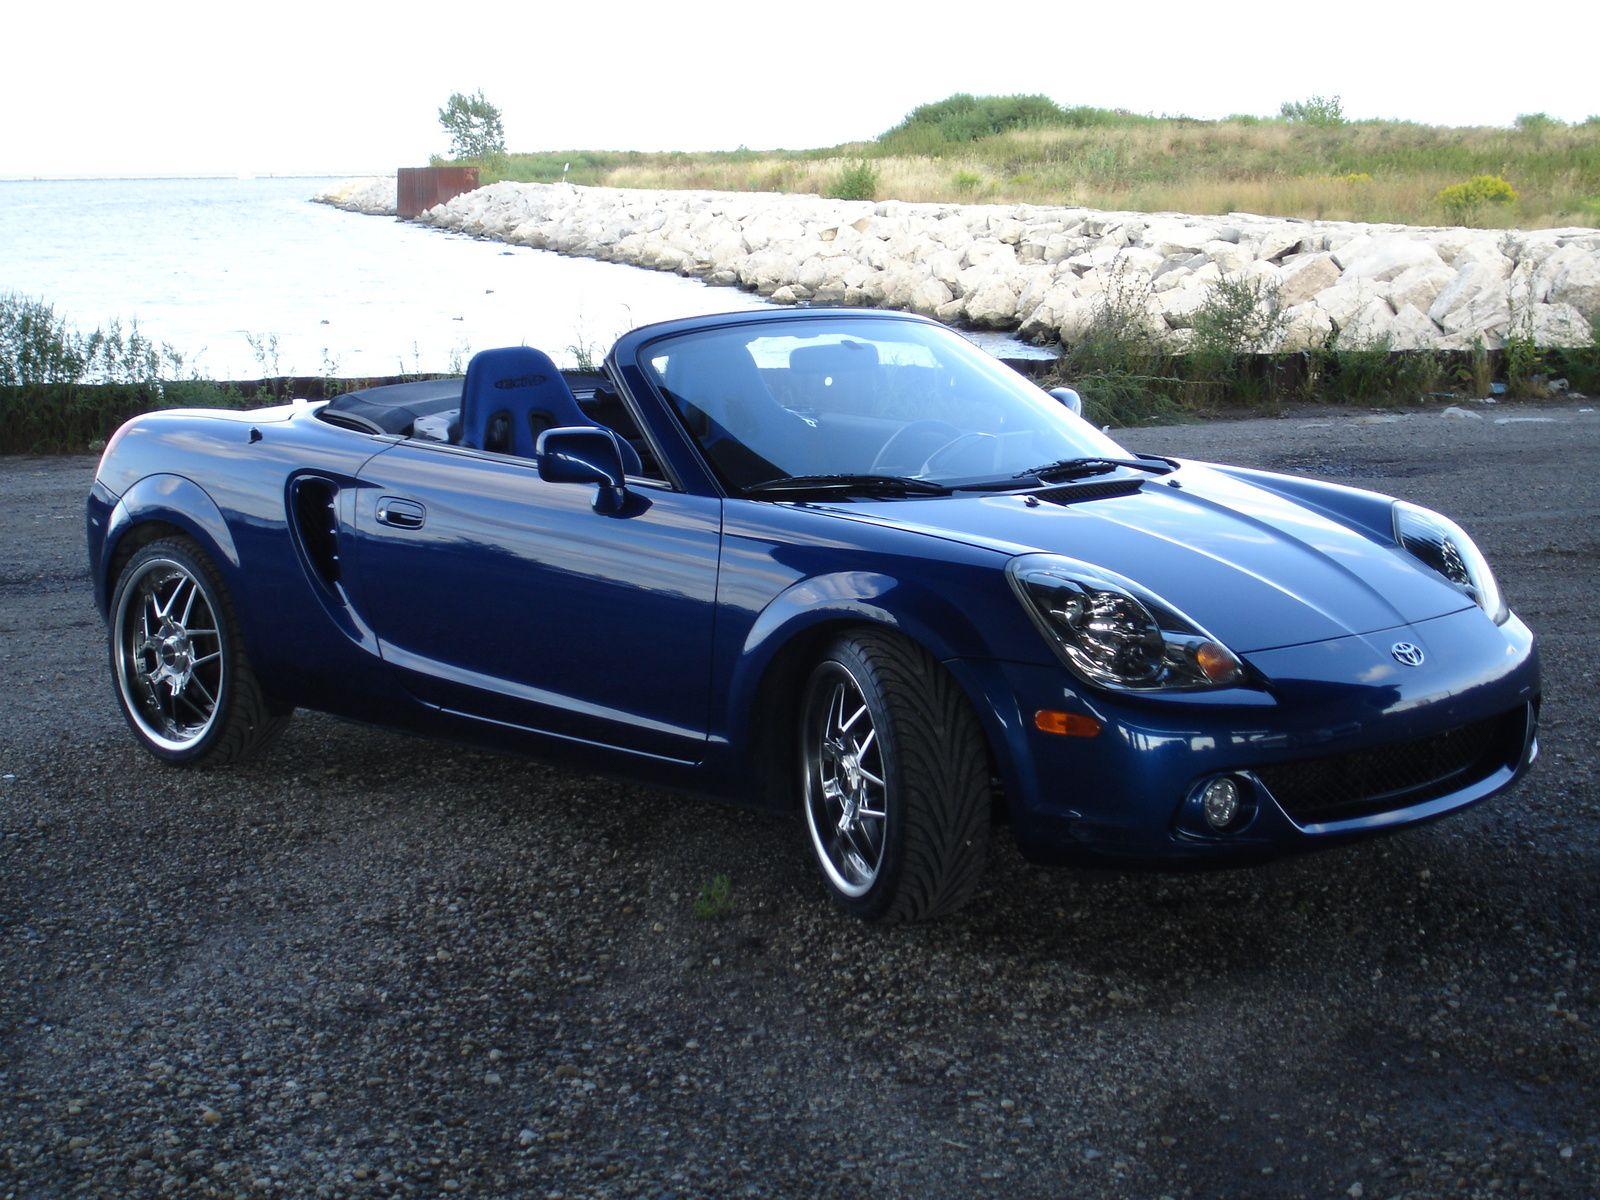 2003 toyota mr2 spyder 138 hp 0 60 7 seconds top